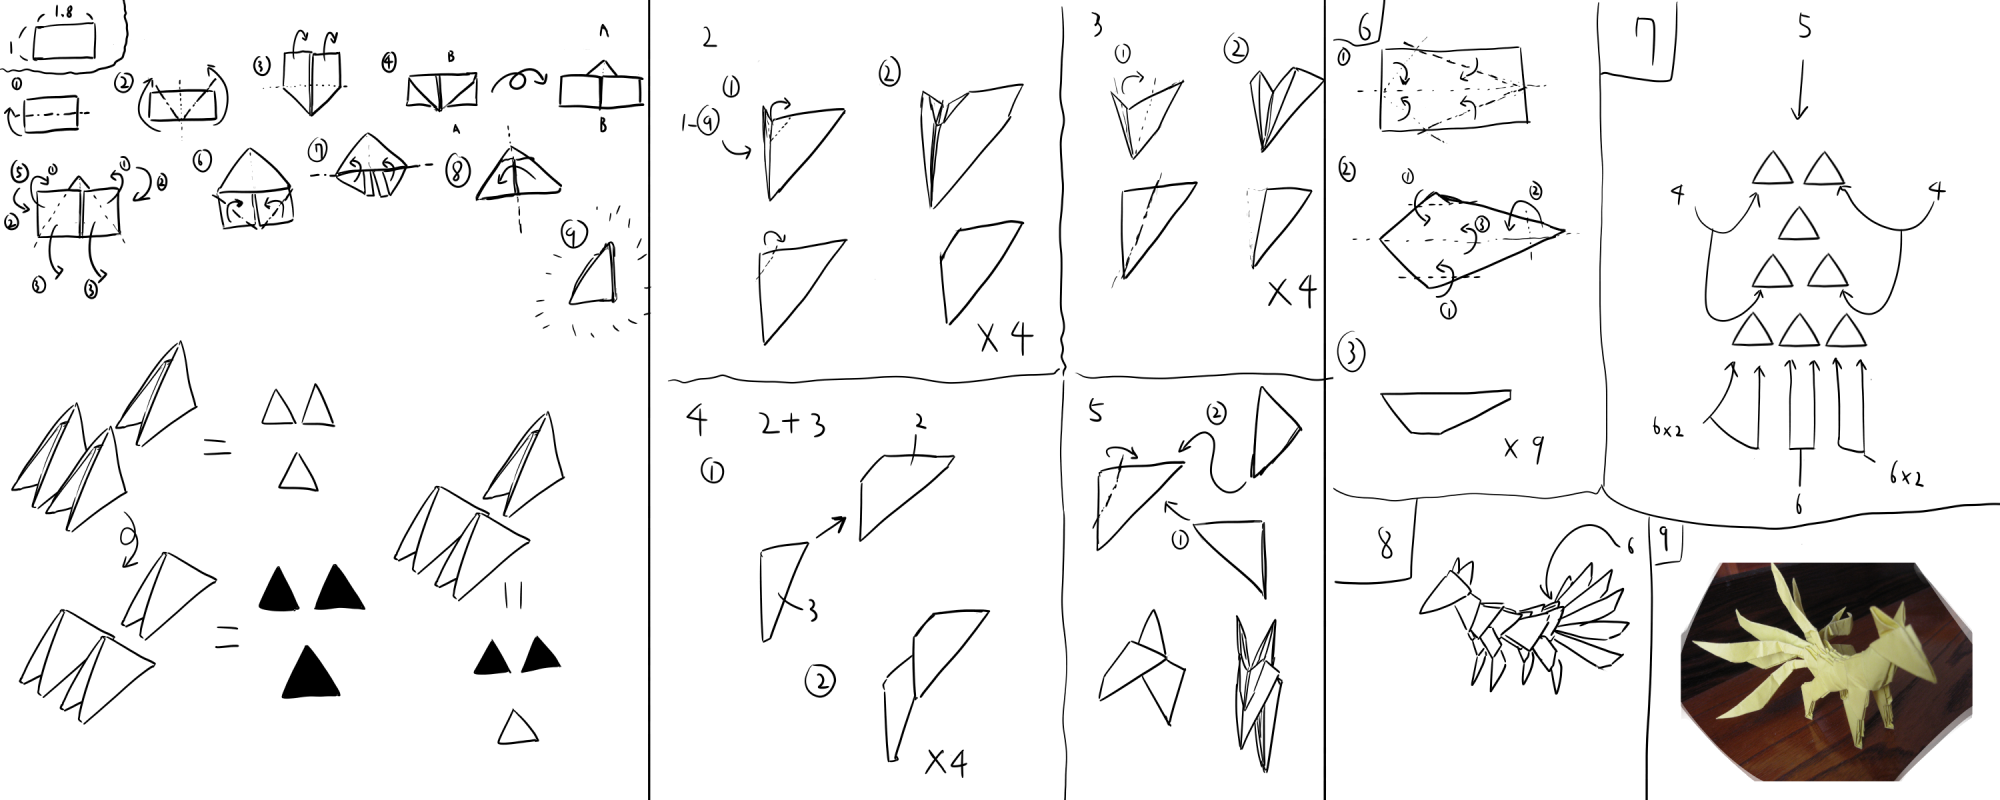 hight resolution of 3d origami nine tailed fox how to build by kumazaza deviantart com3d origami nine tailed fox